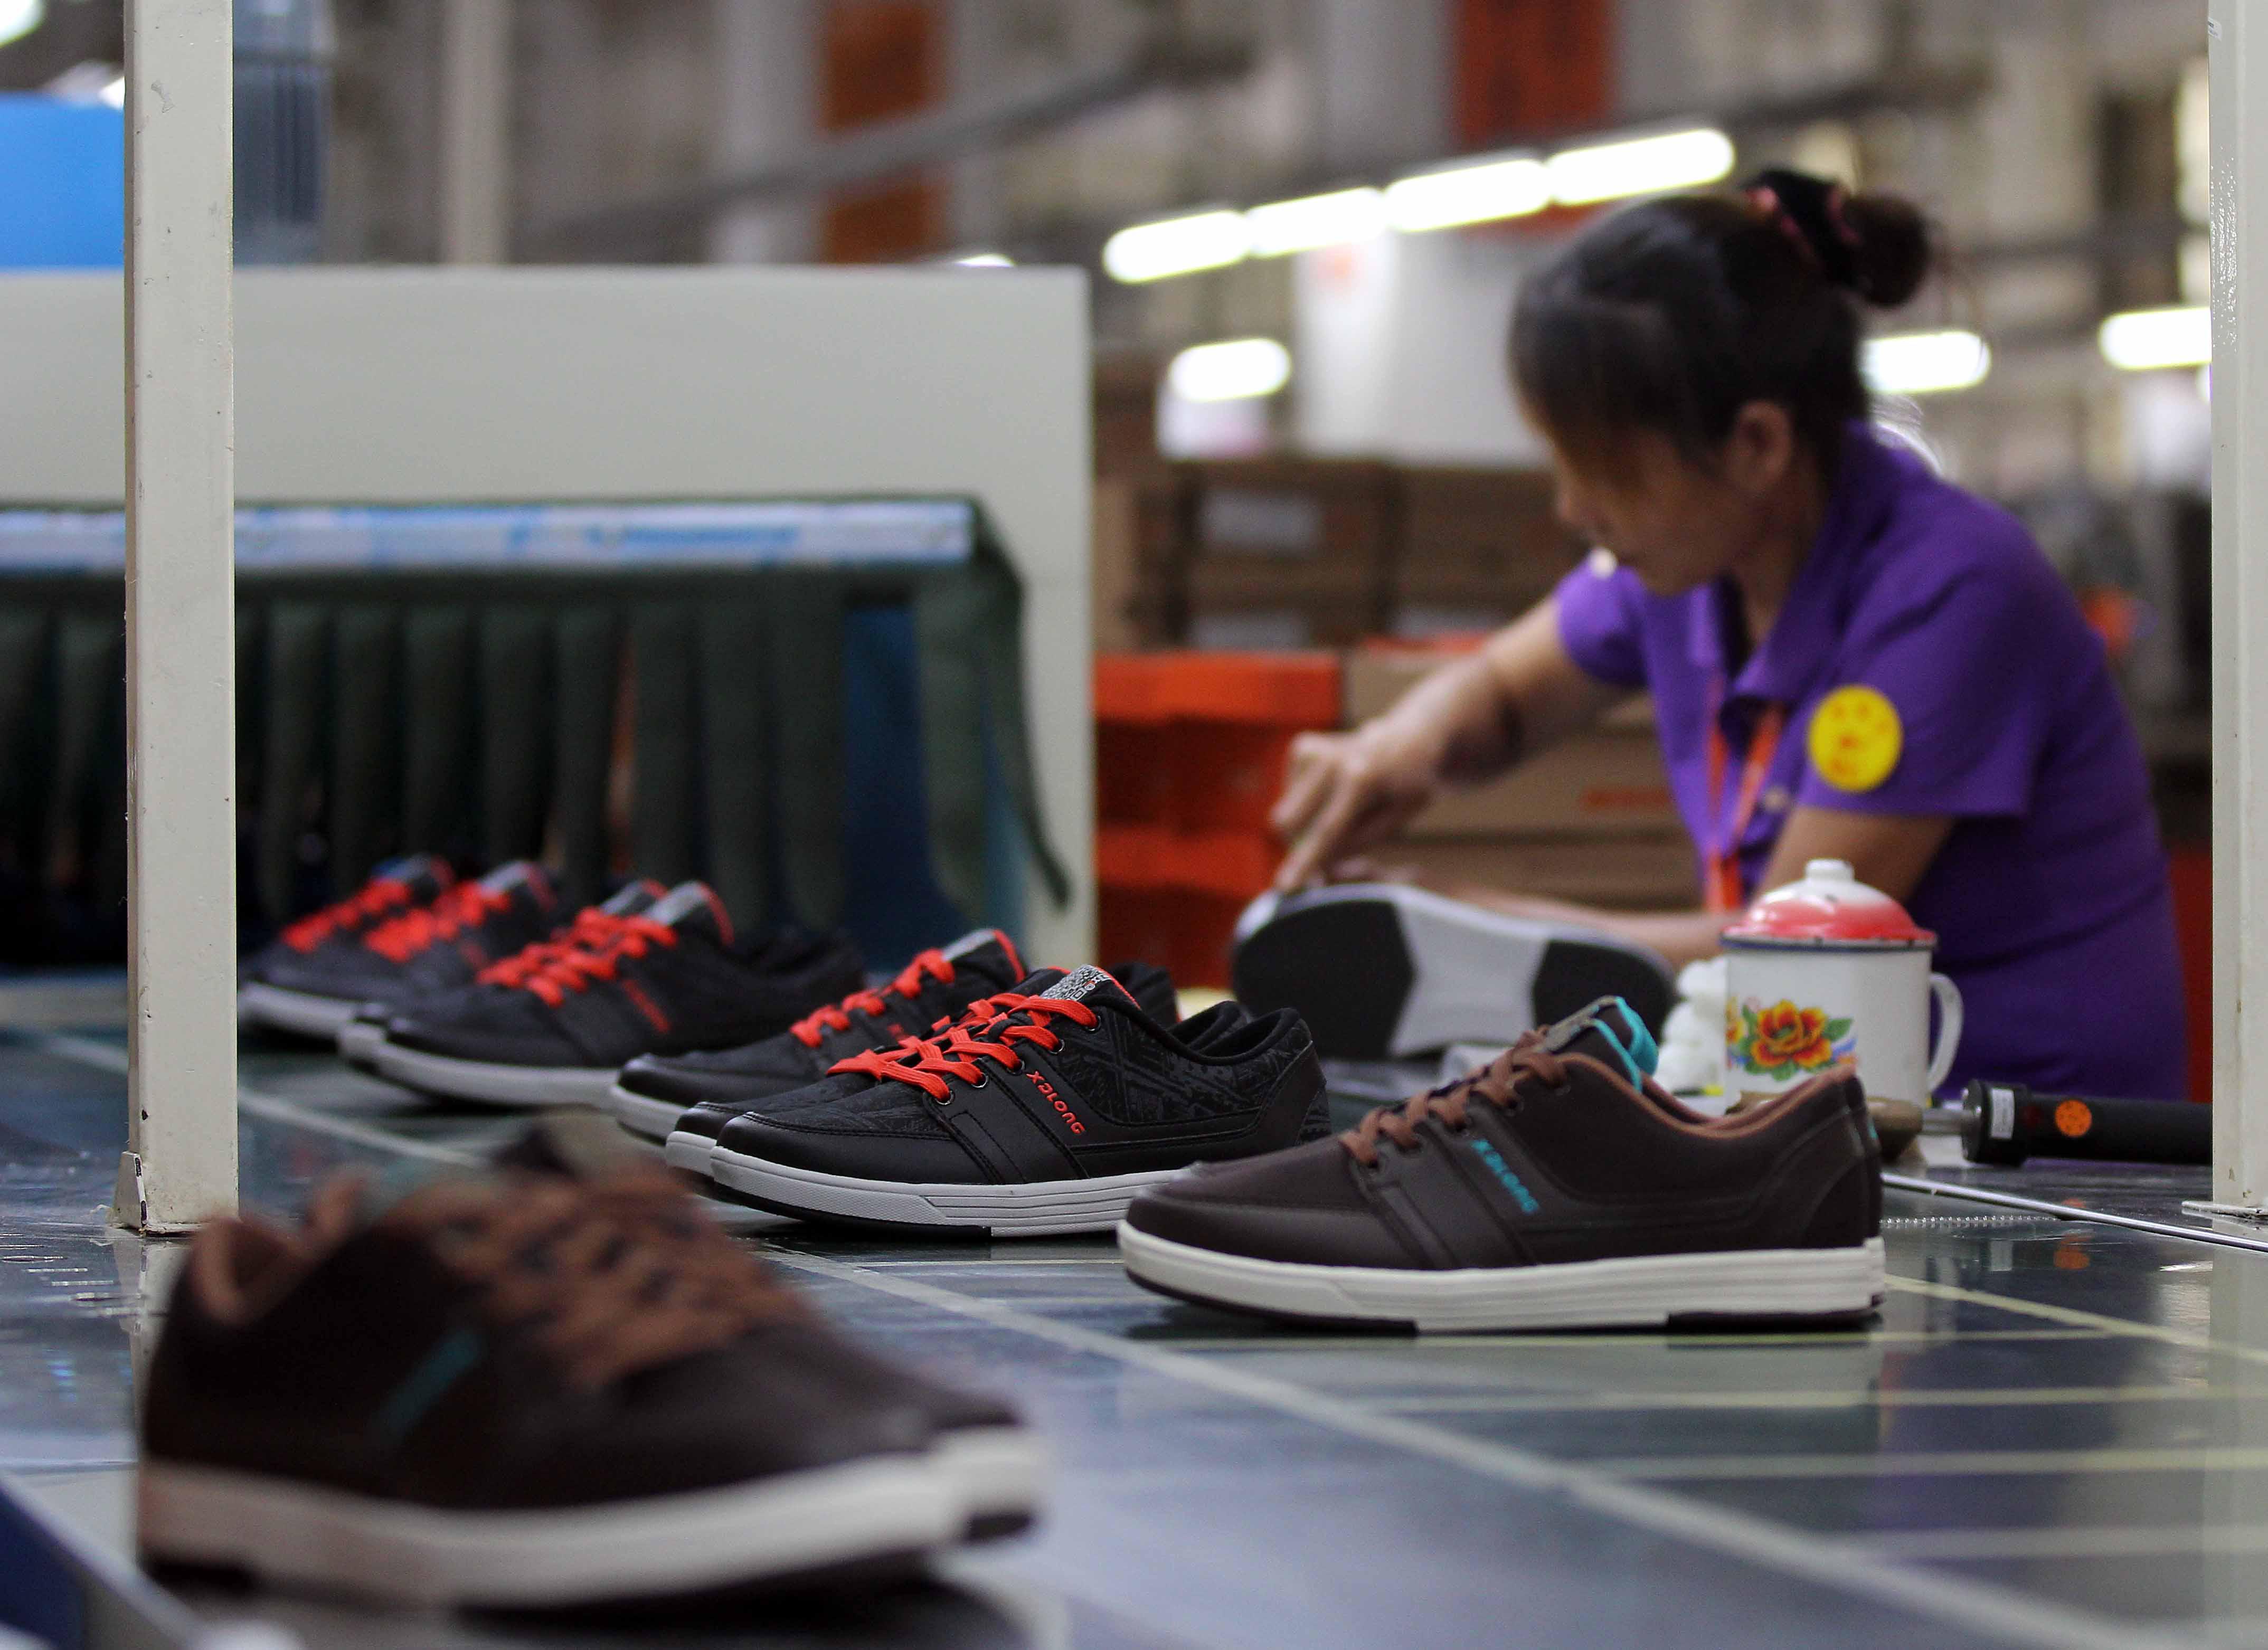 Sito Yb7gvf6y Scarpe Nike Cinesi Web Prezzi VqzGMpLUS